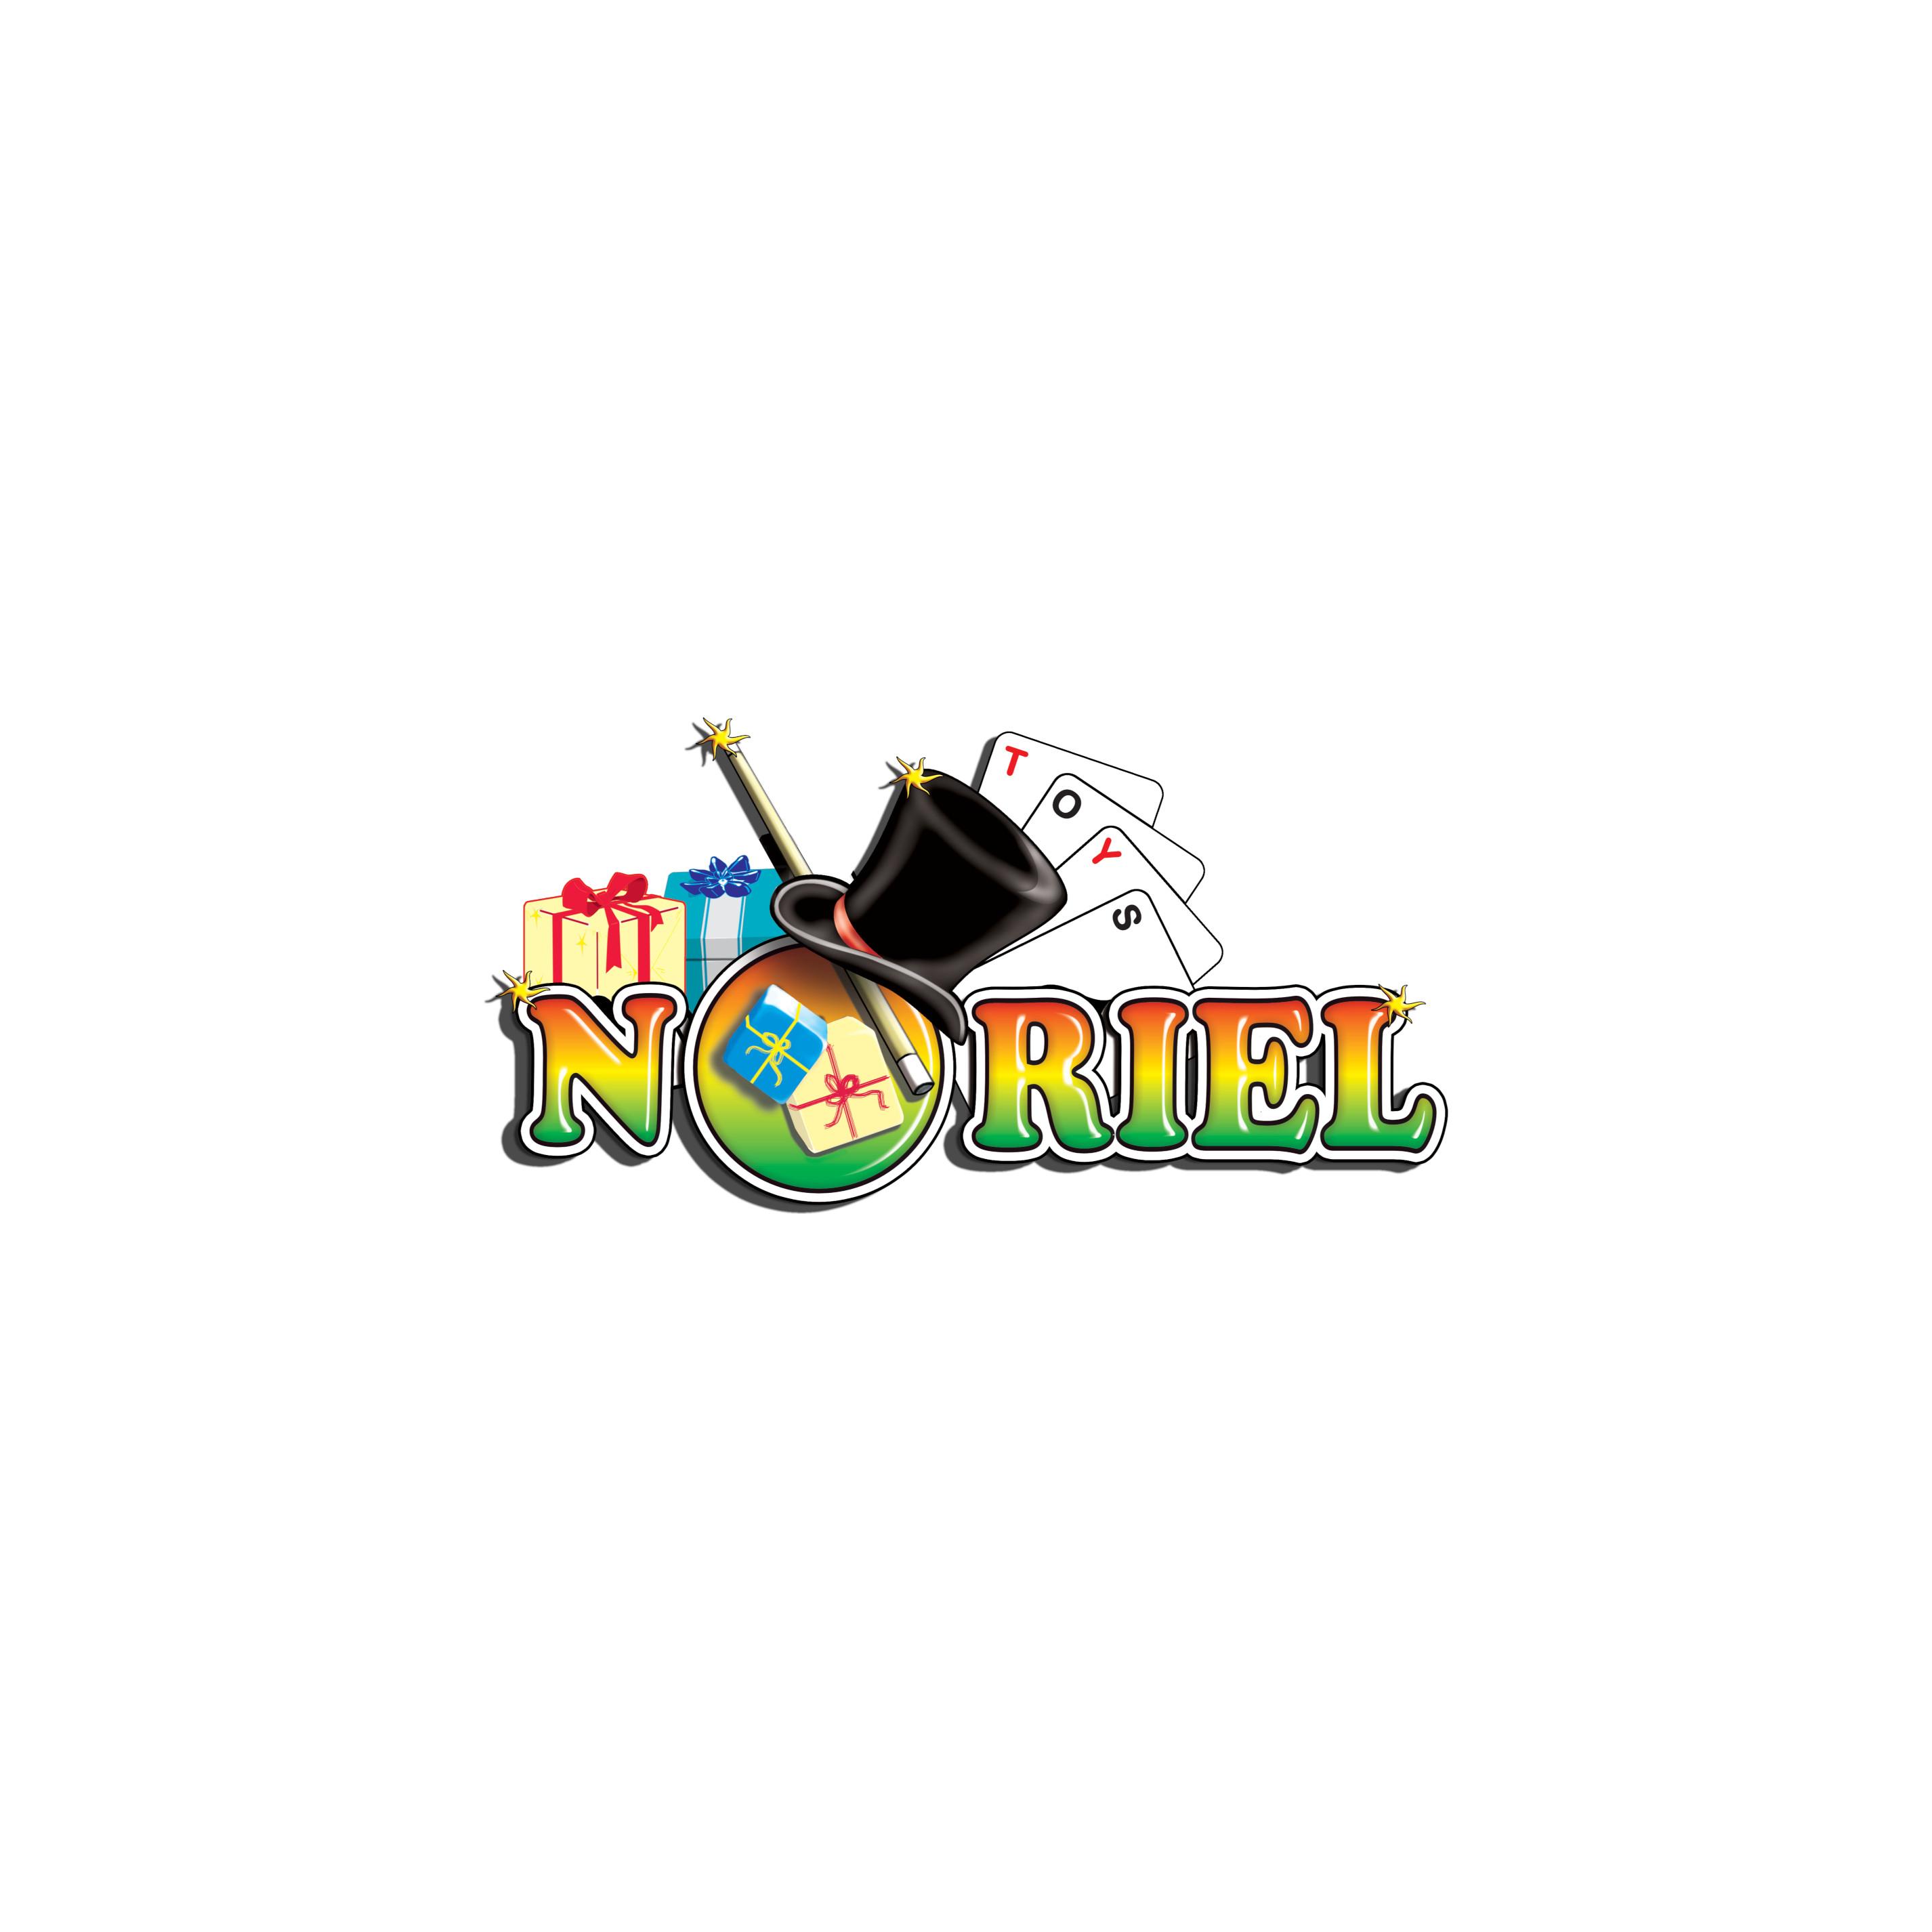 Tricou copii Joystar Colectia Beach 4I2115